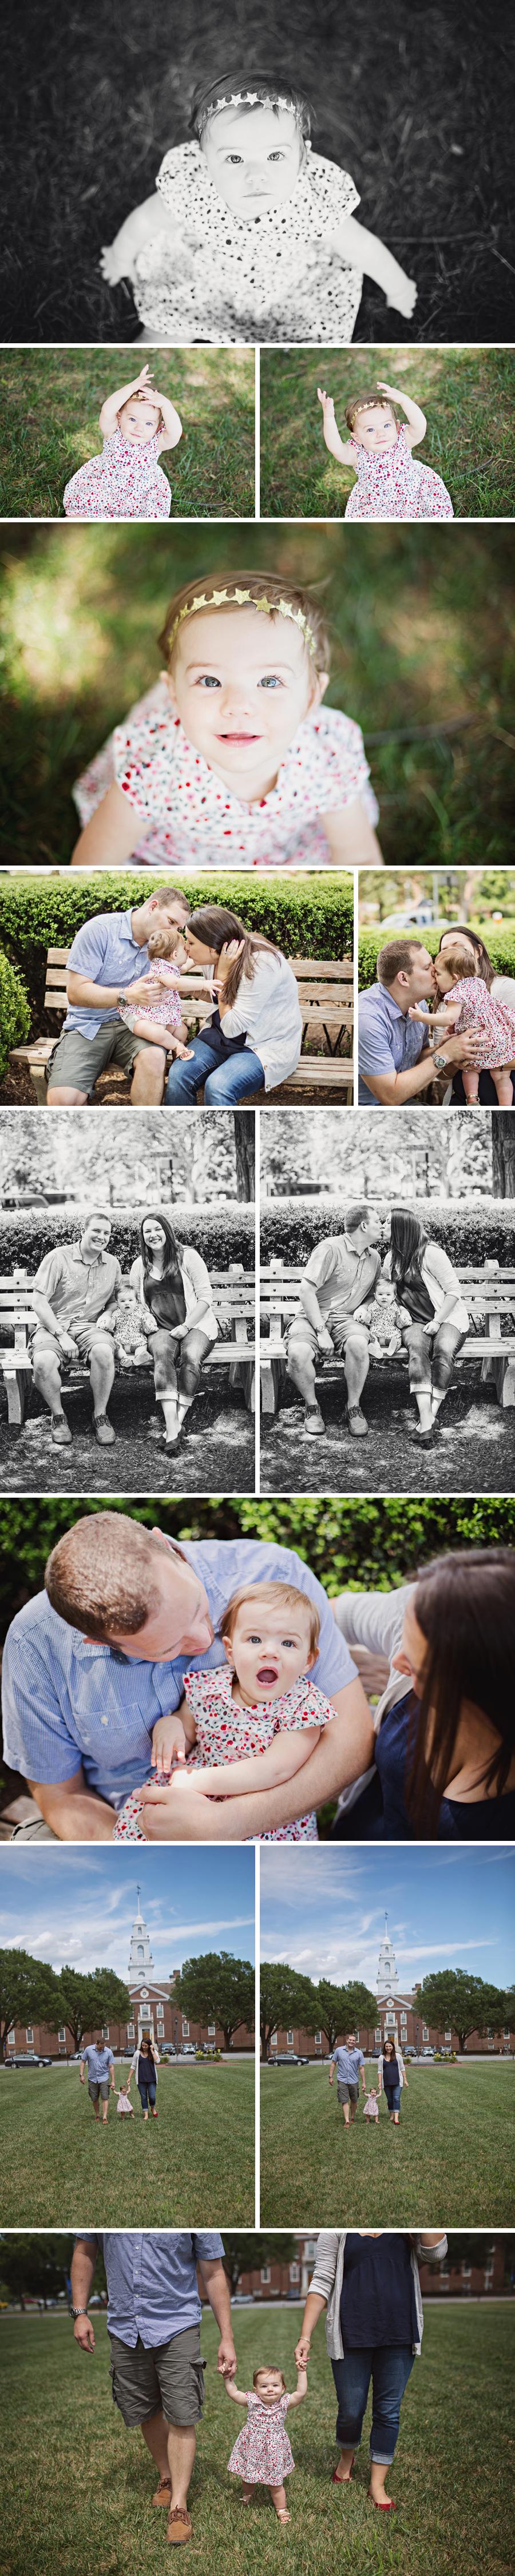 Delaware-Baby-PhotographerG001